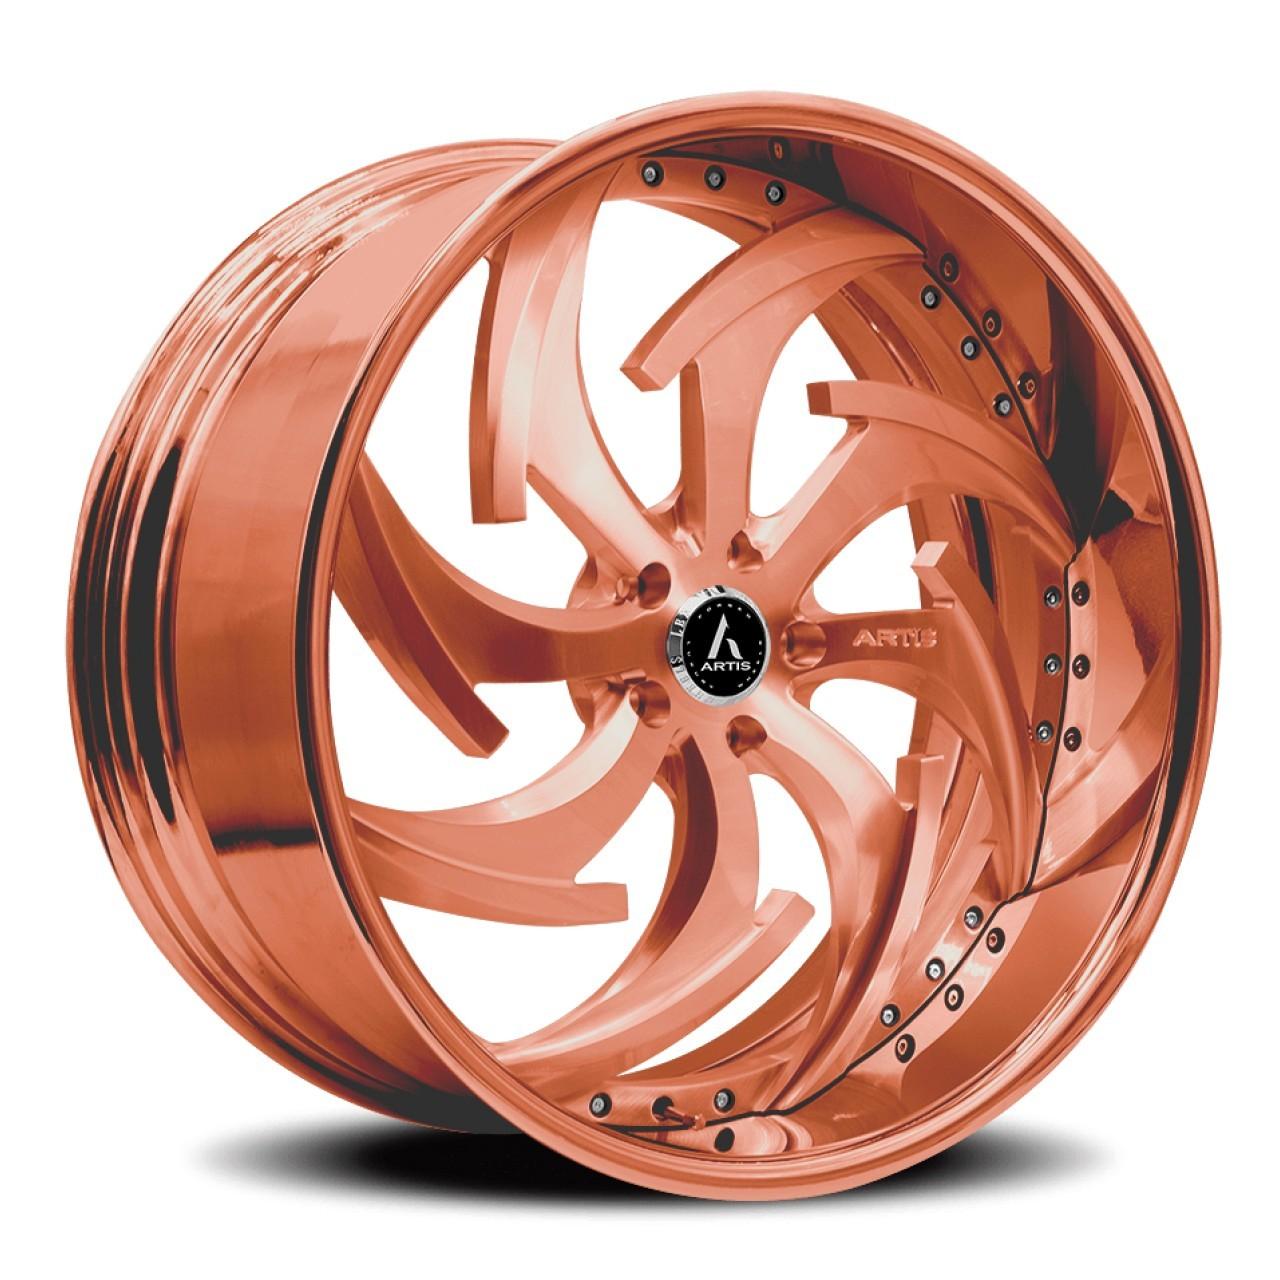 Artis Dagger forged wheels